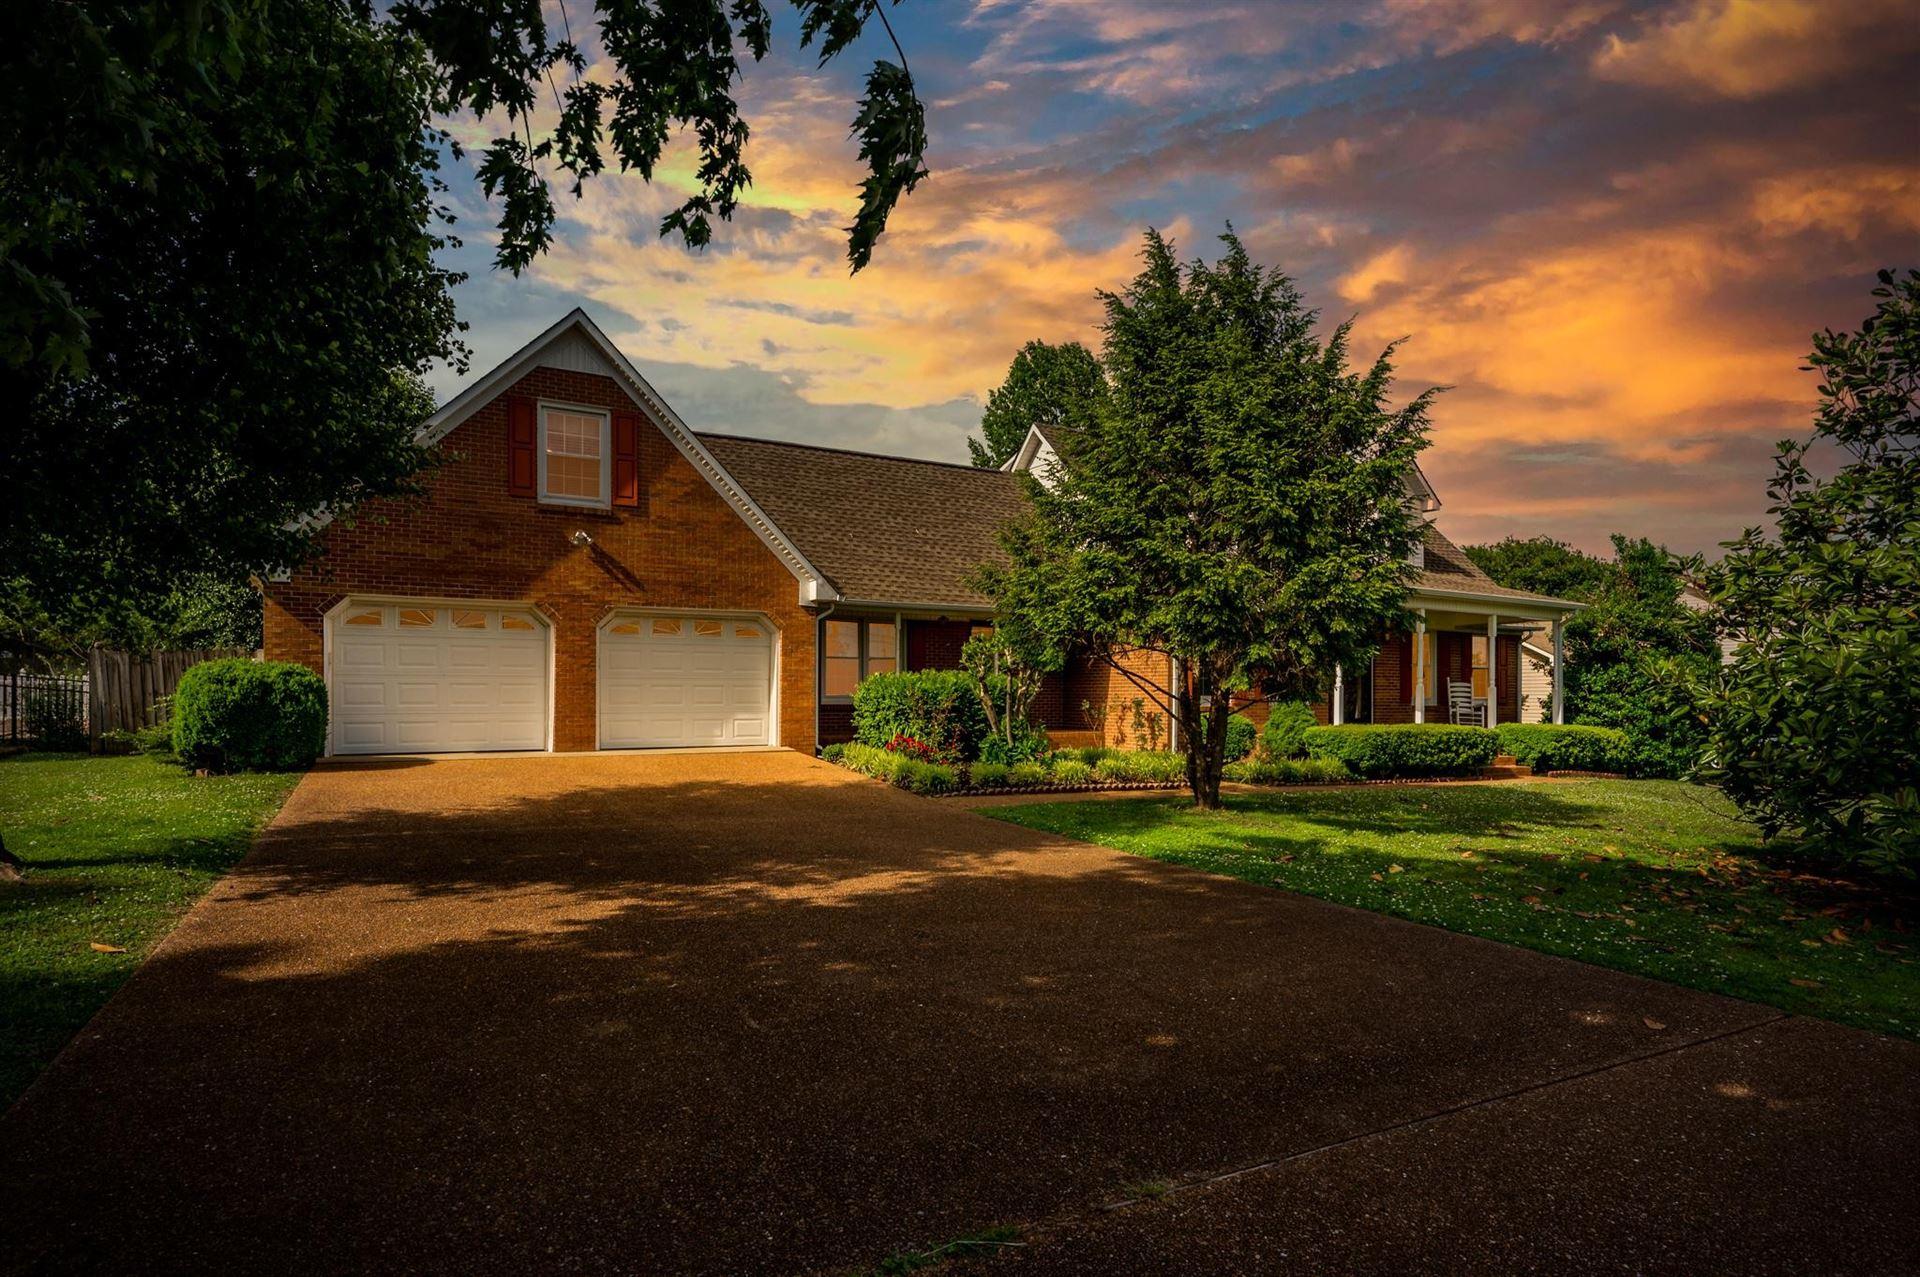 413 Sunnyside Lane, Columbia, TN 38401 - MLS#: 2257565